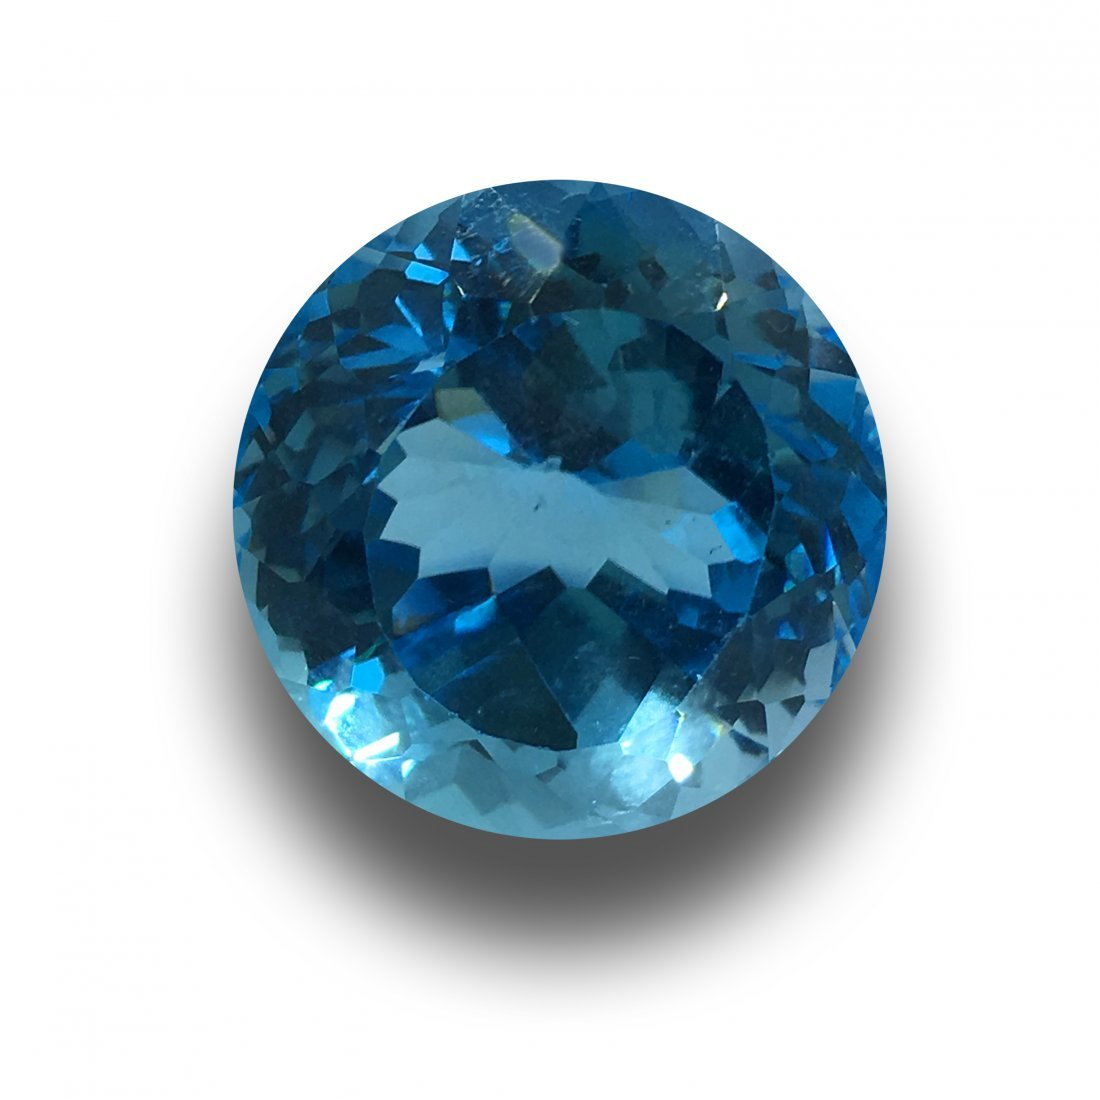 42.51 Carats  Natural Unheated Blue Topaz